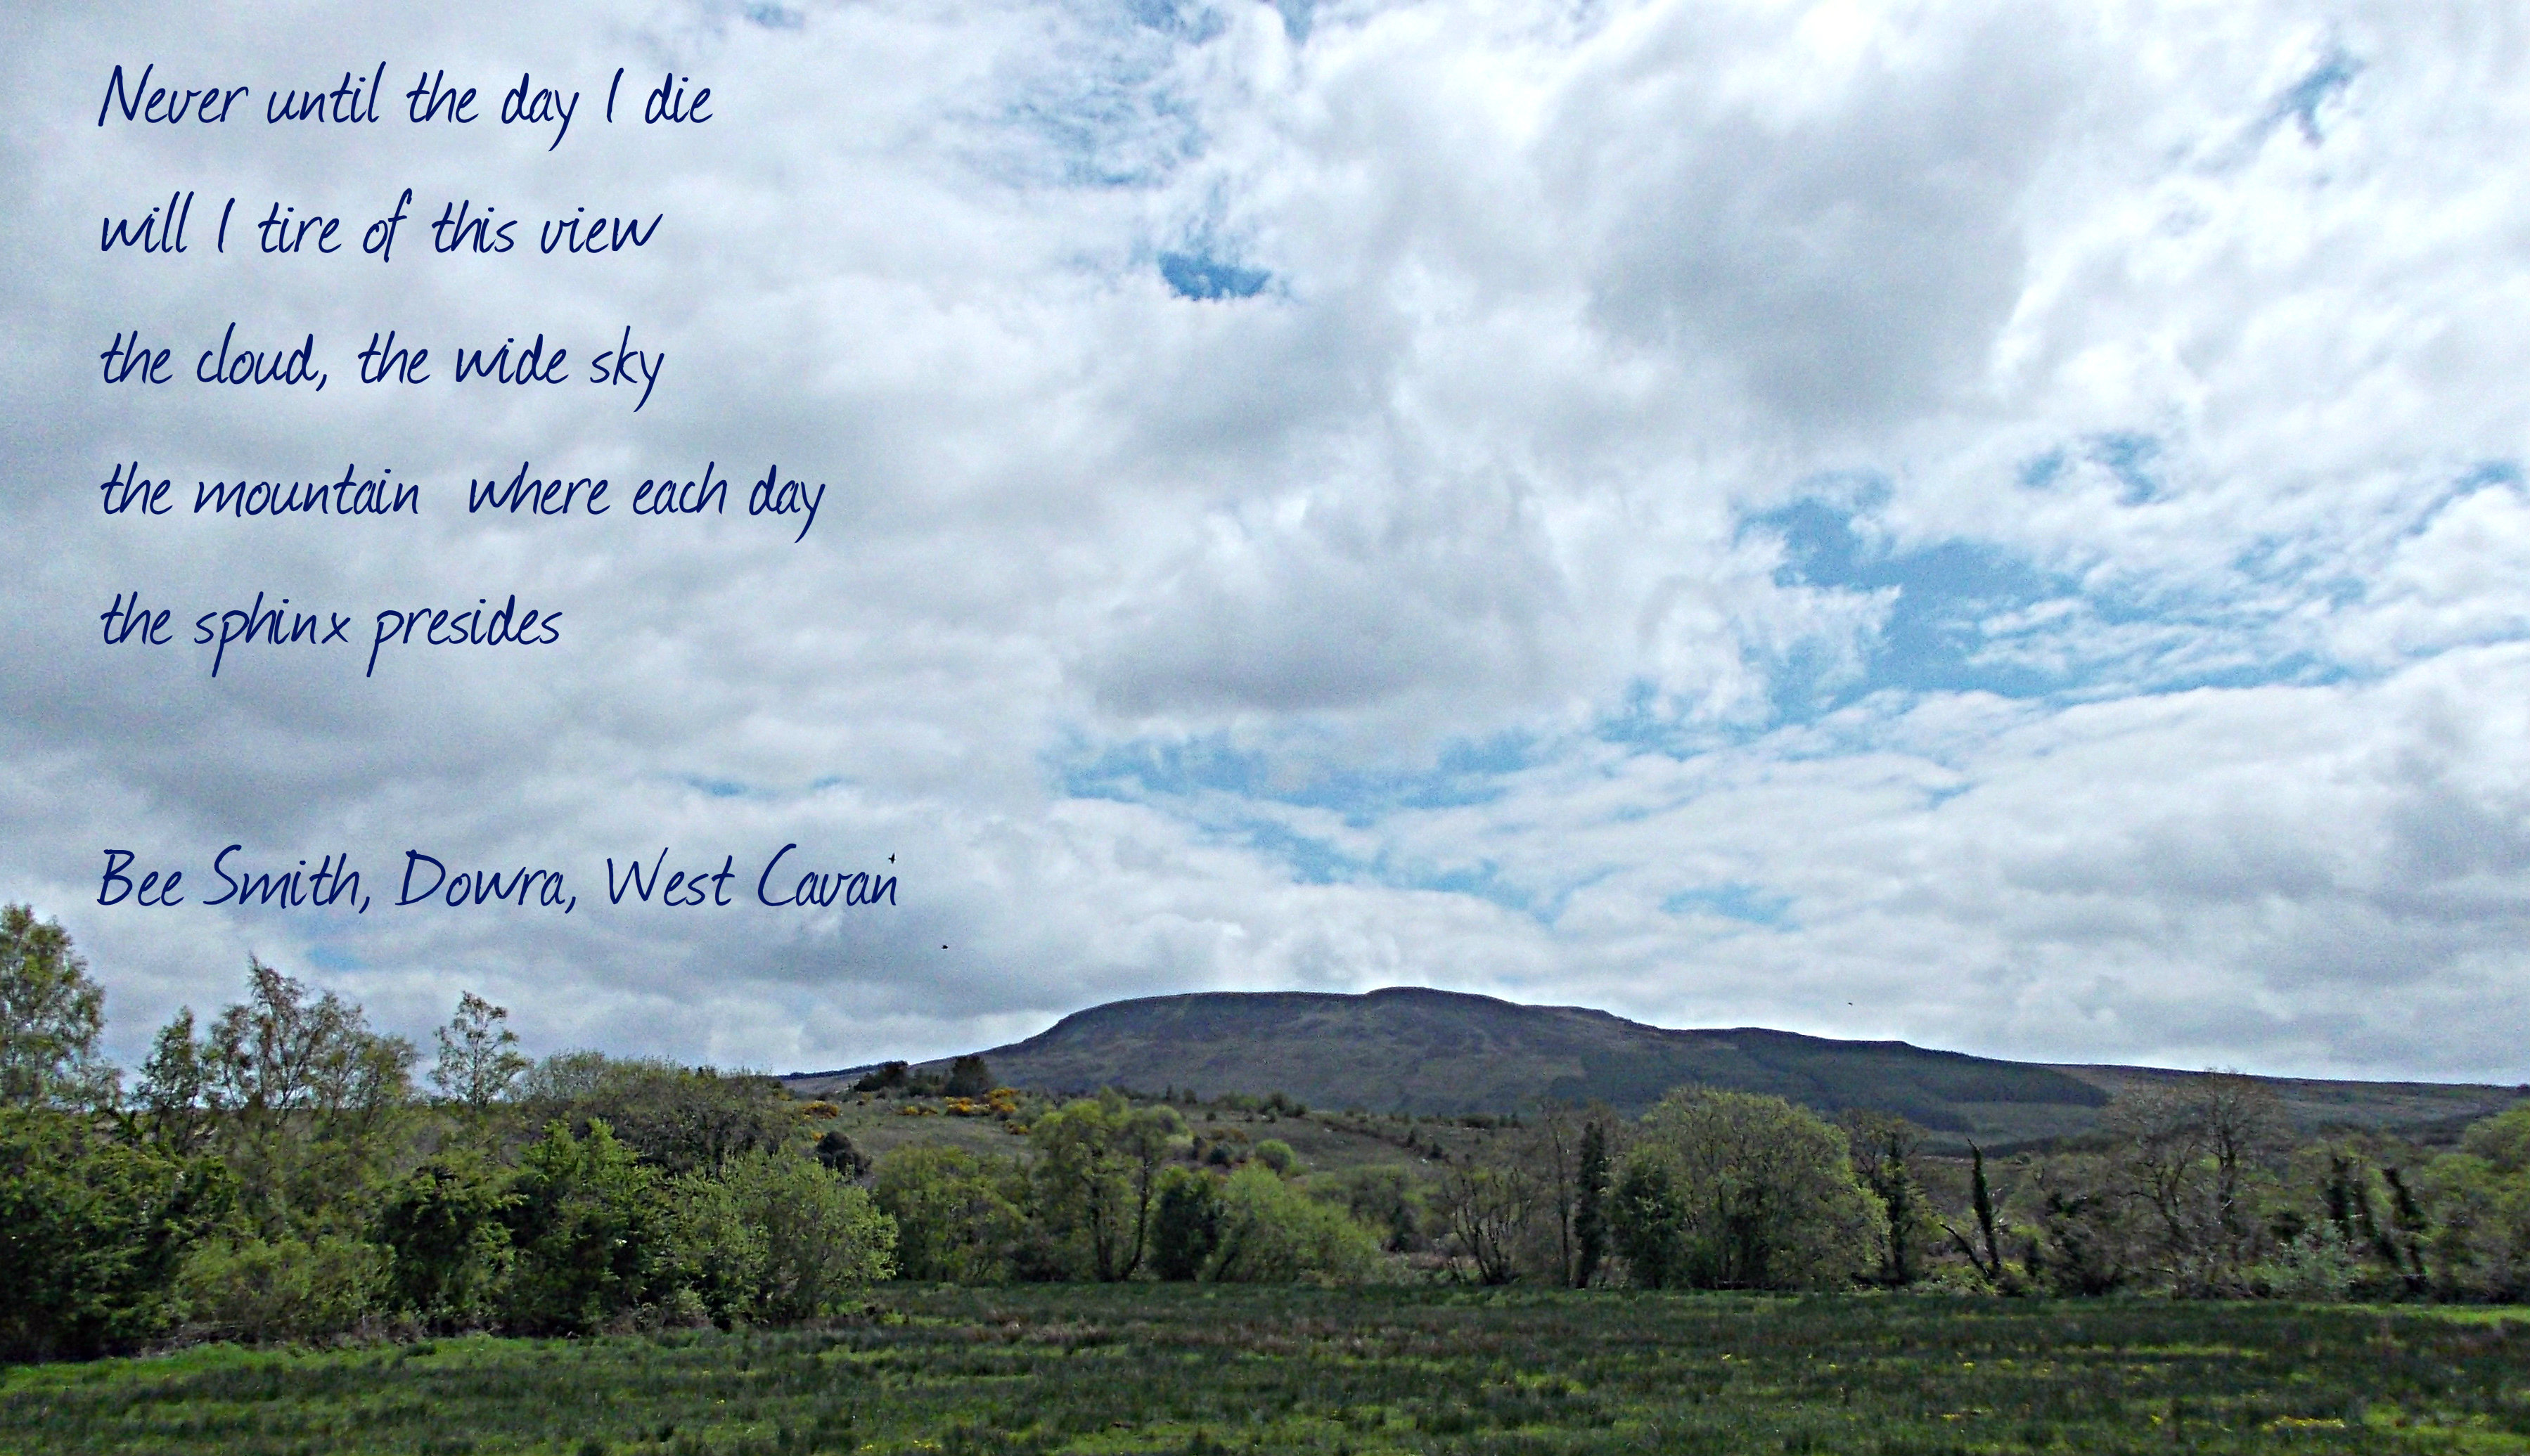 Playbank poem